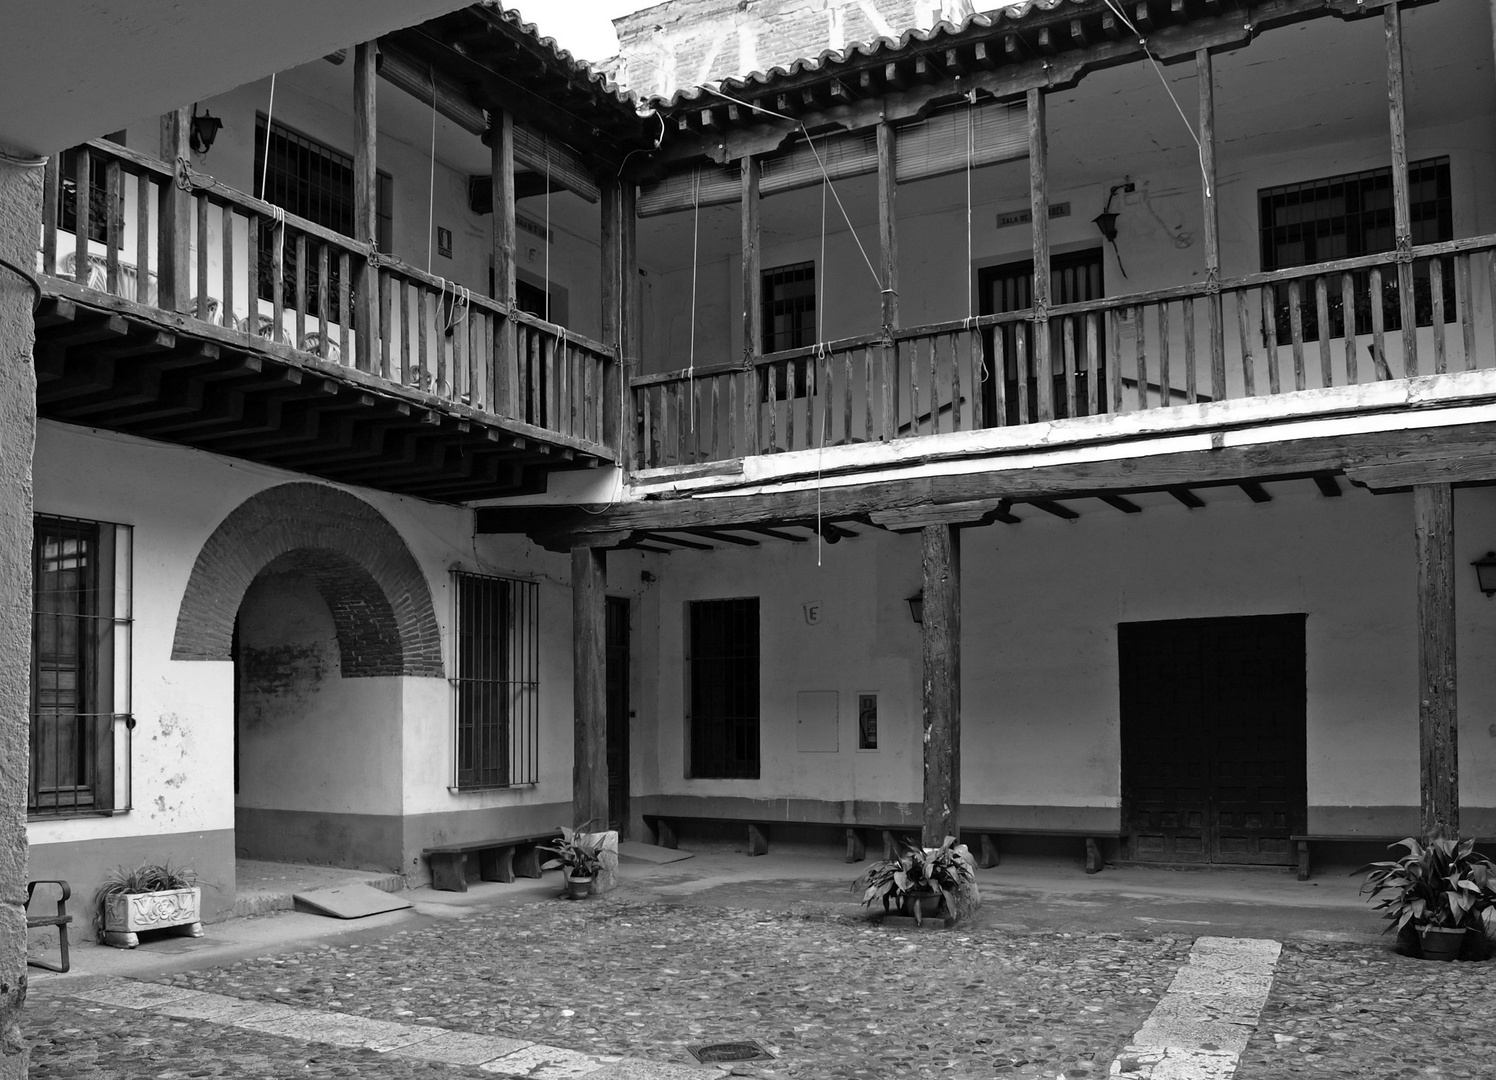 El Hospitalillo. Alcala de Henares